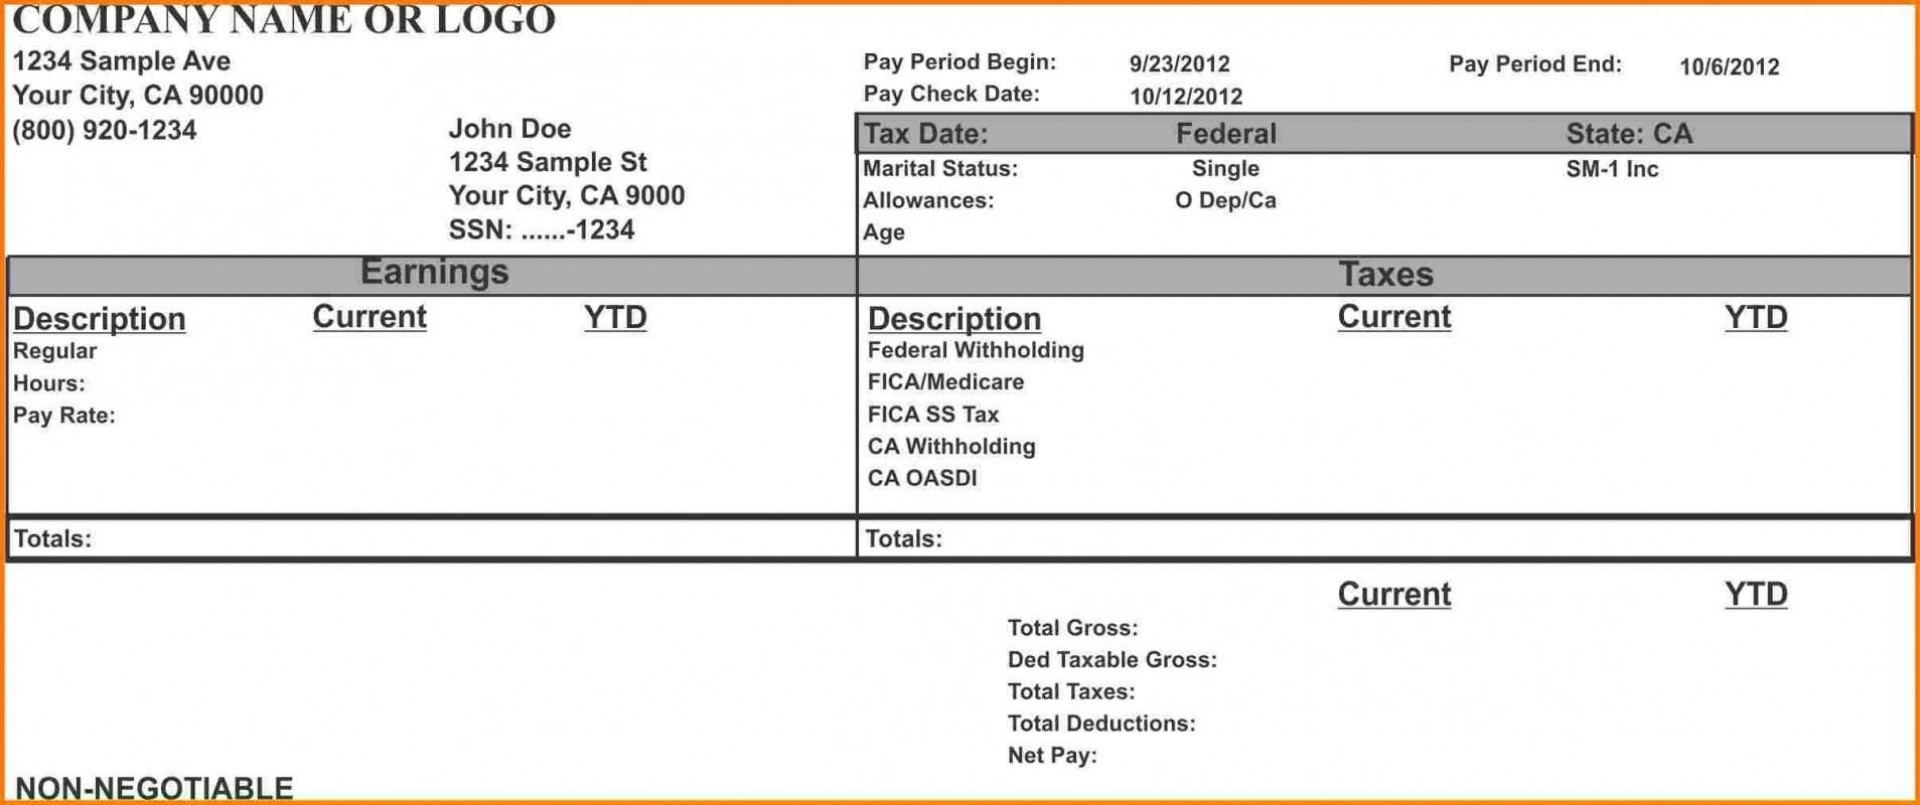 000 Wondrou Pay Stub Template Word Idea  Document Check Microsoft Free1920